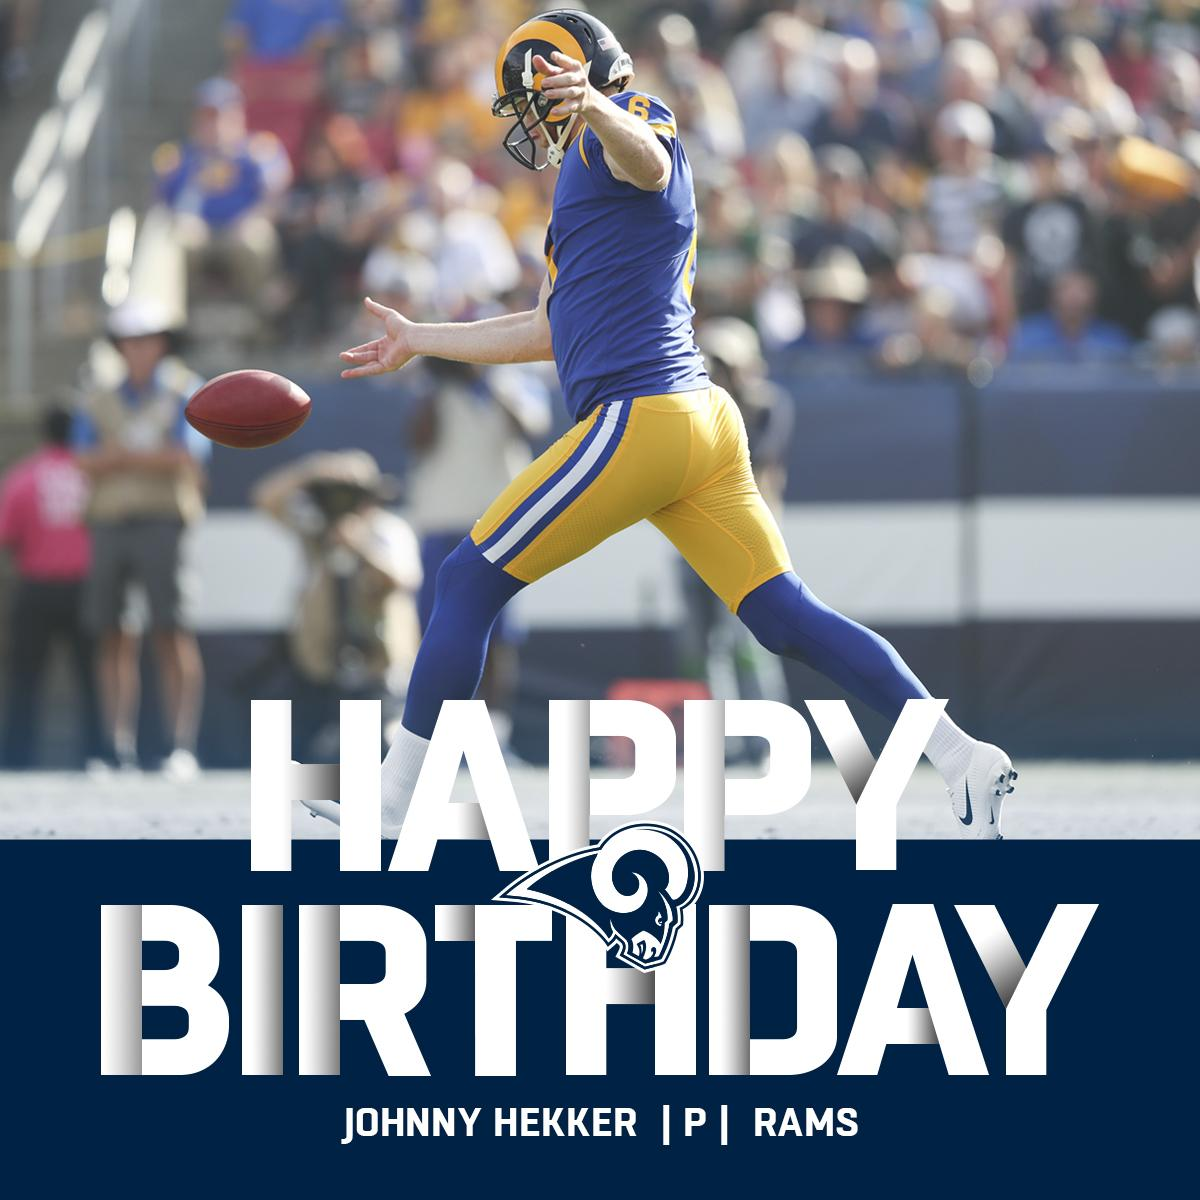 One of the greatest punters... ever.  HAPPY BIRTHDAY, 4x @RamsNFL Pro Bowler @JHekker! ���� https://t.co/EiOSu74vQj